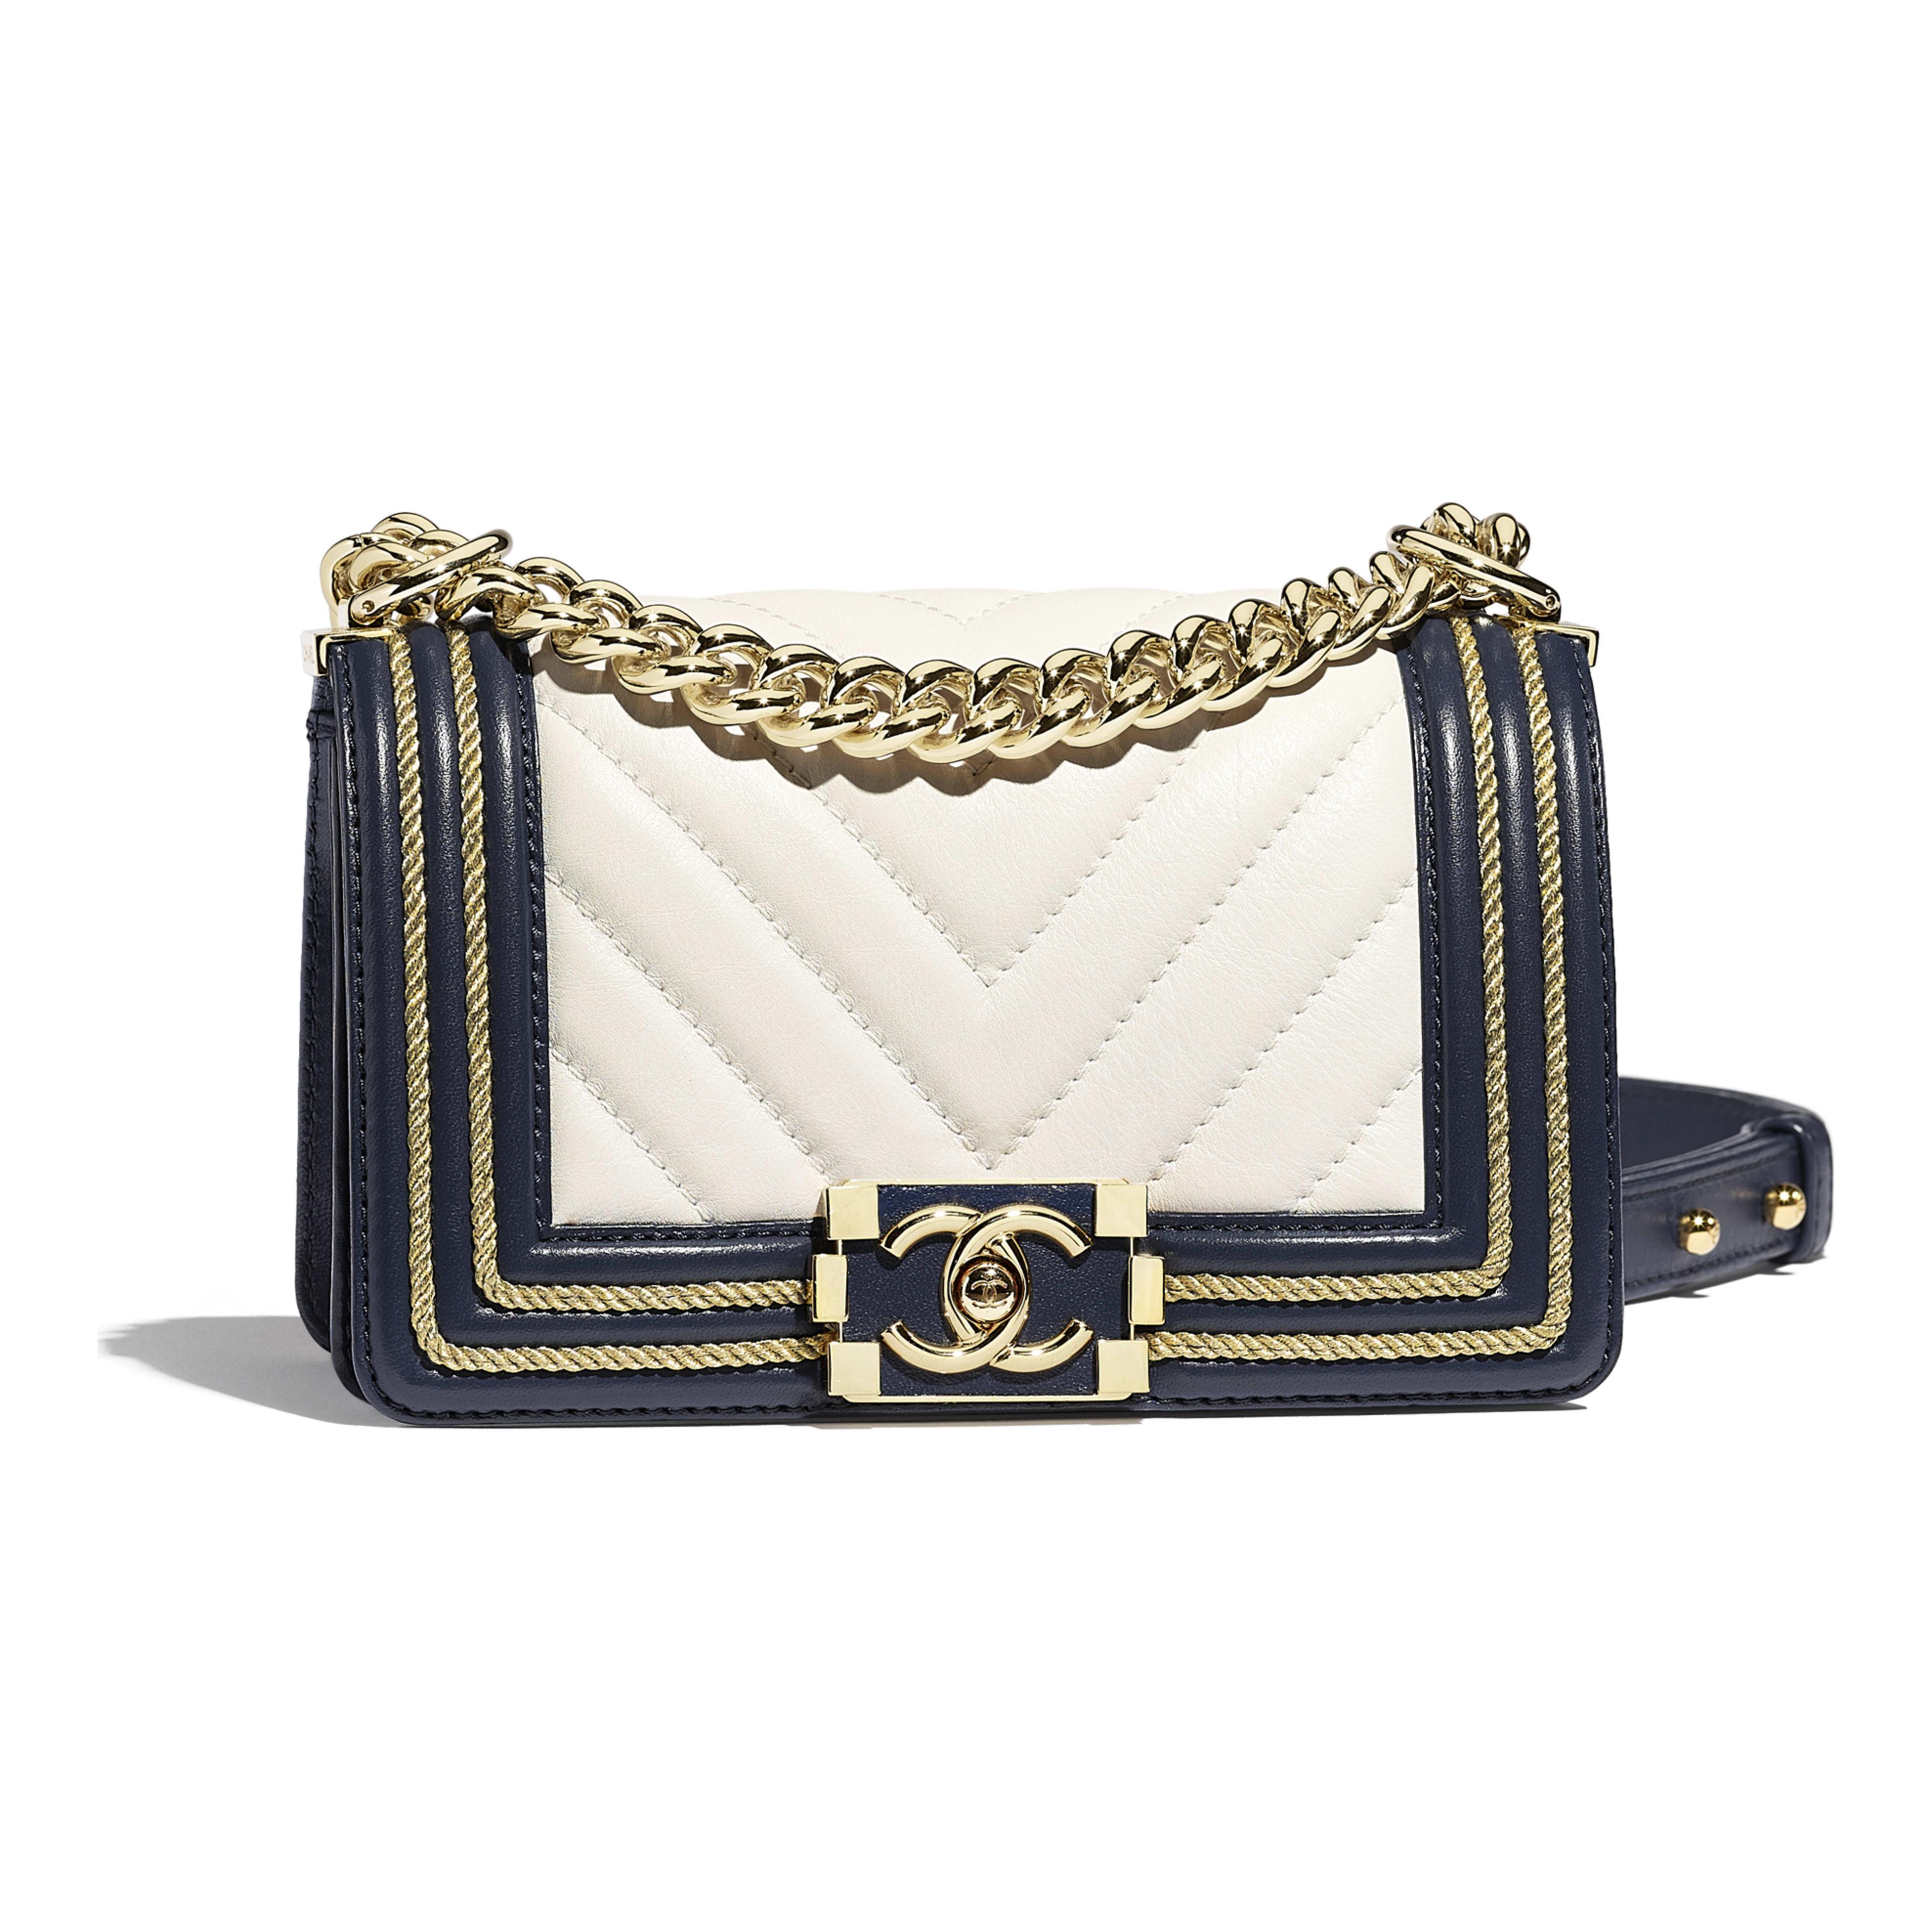 a75fe795e829 Calfskin Braid Gold Tone Metal White Navy Blue Small Boy Chanel